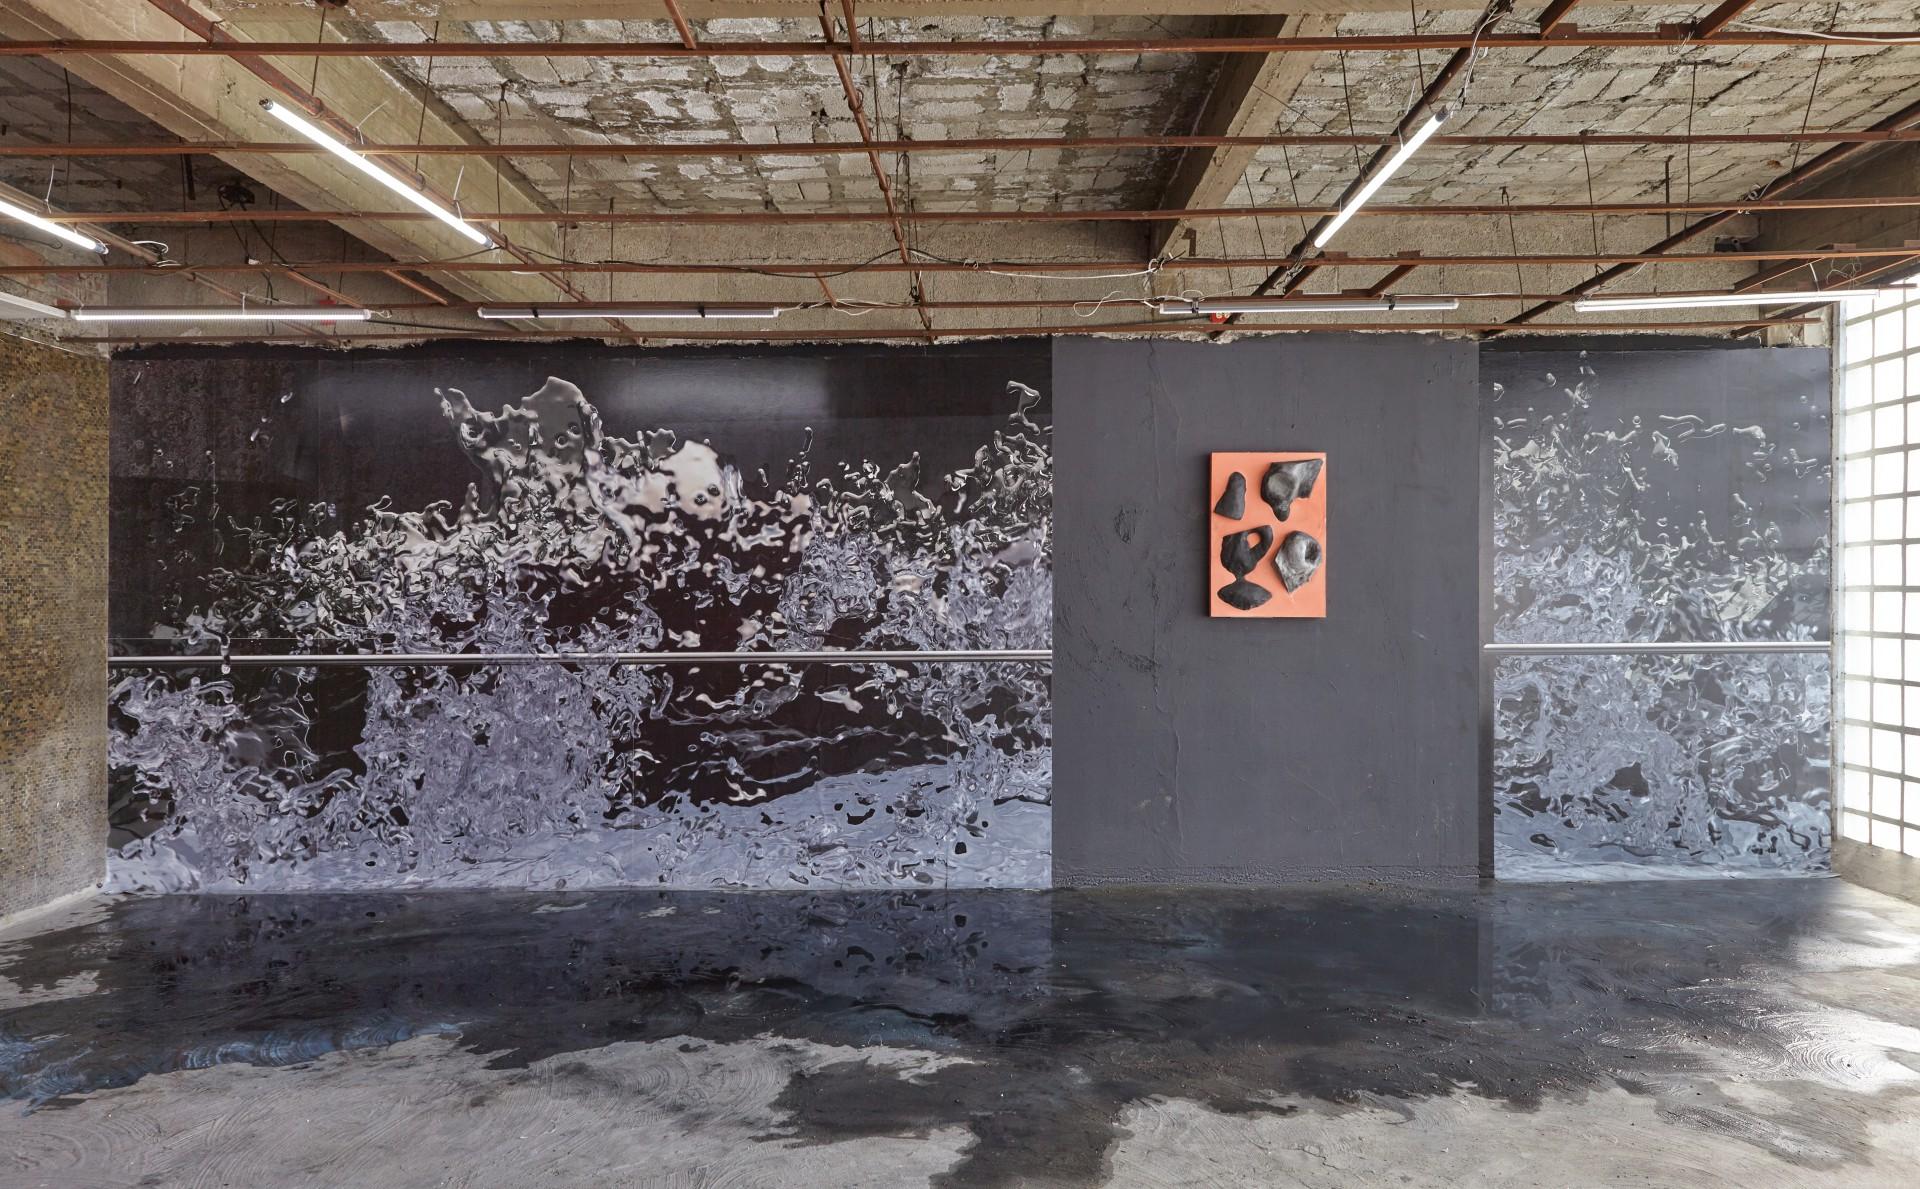 Ben Van den Berghe Freak Wave Platform, El Quinto Piso, Mexico City, 2018